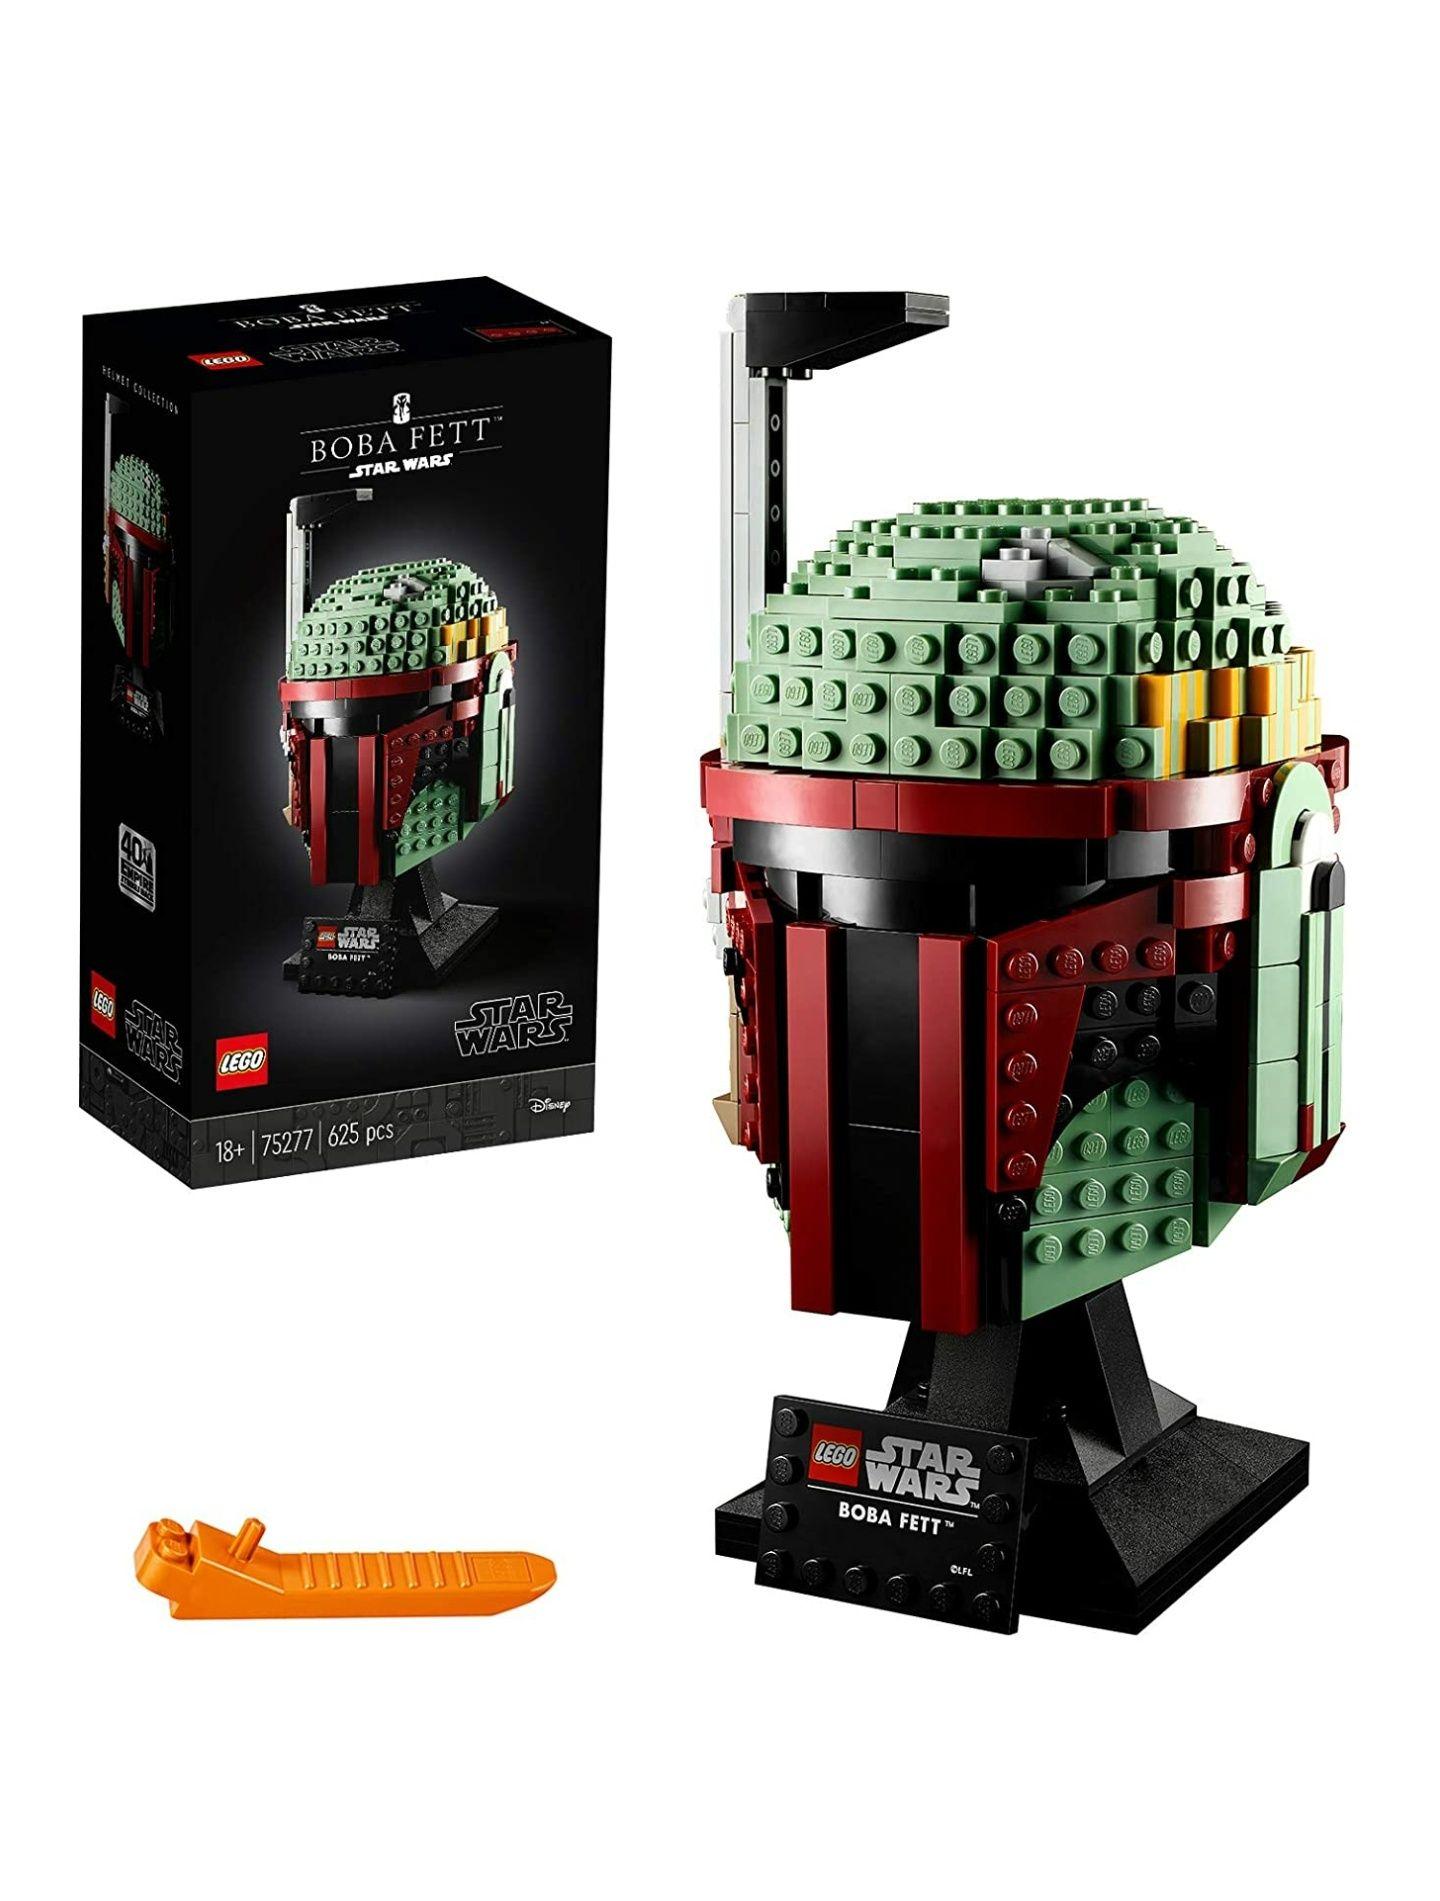 LEGO® 75277 Boba Fett Helm, Star Wars Charakter als Bauset zum Sammeln